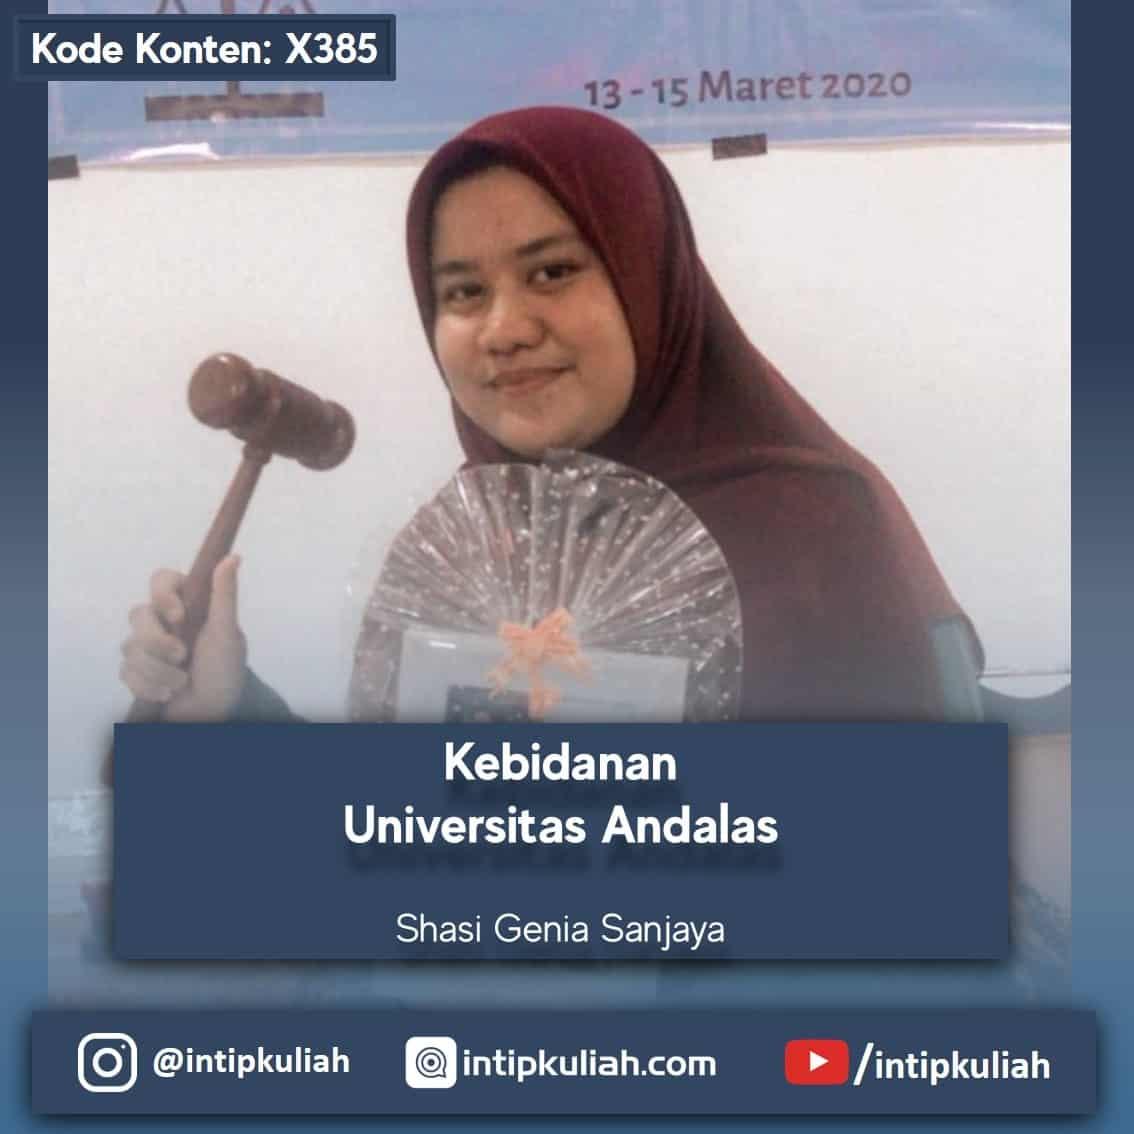 Kebidanan Universitas Andalas (Shasi)